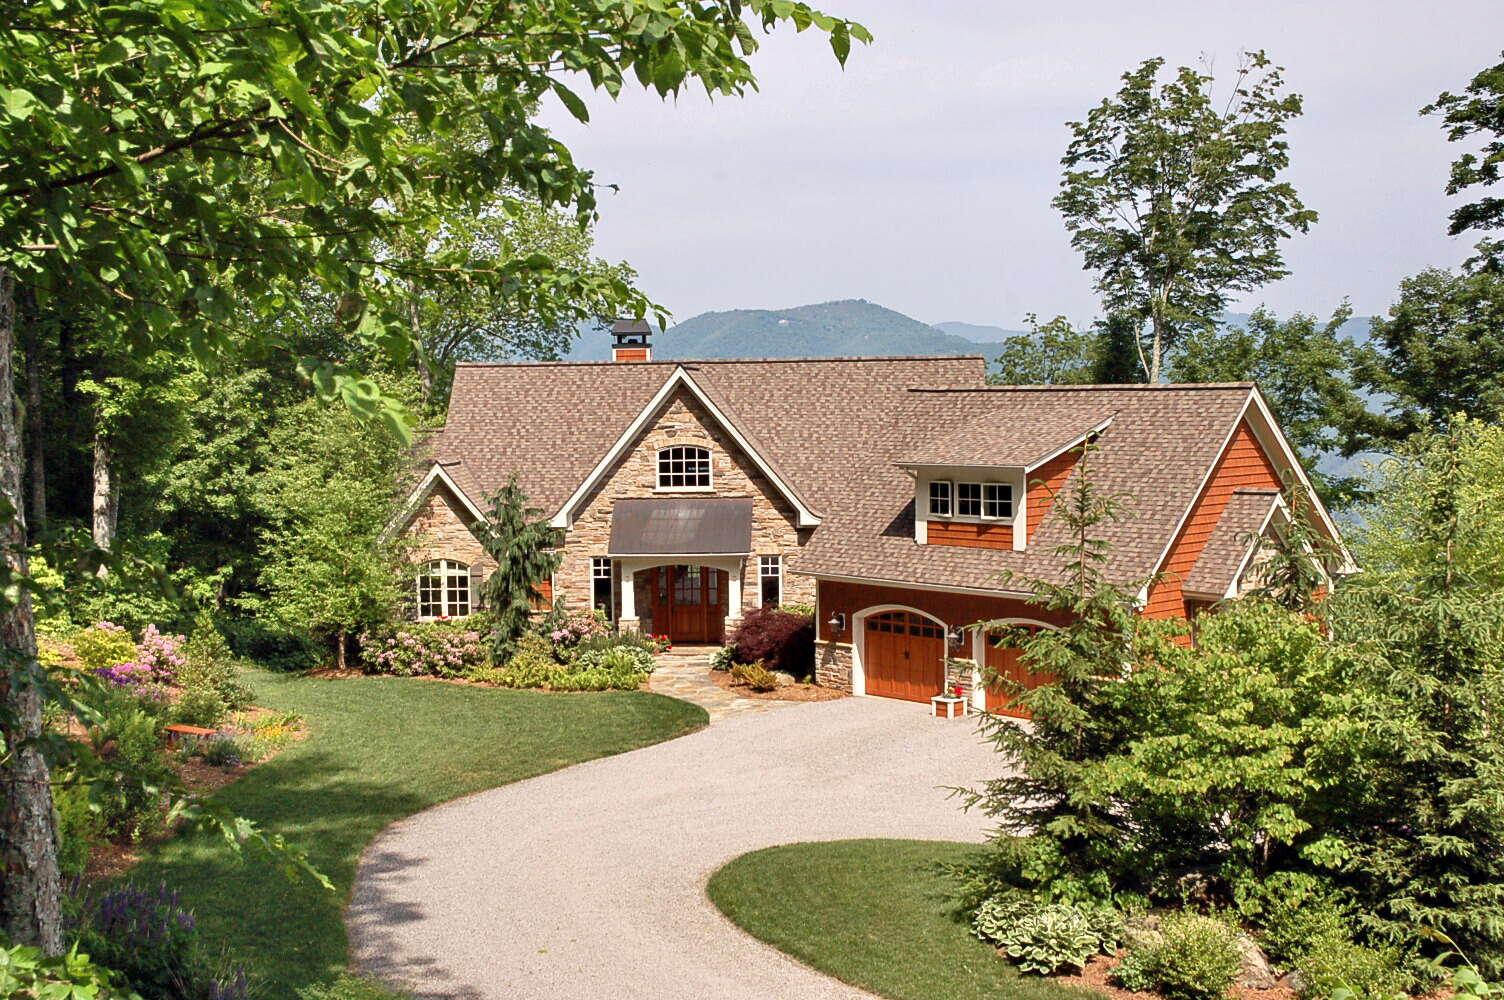 Single Family for Sale at 147 Olympia Lane Waynesville, North Carolina 28786 United States